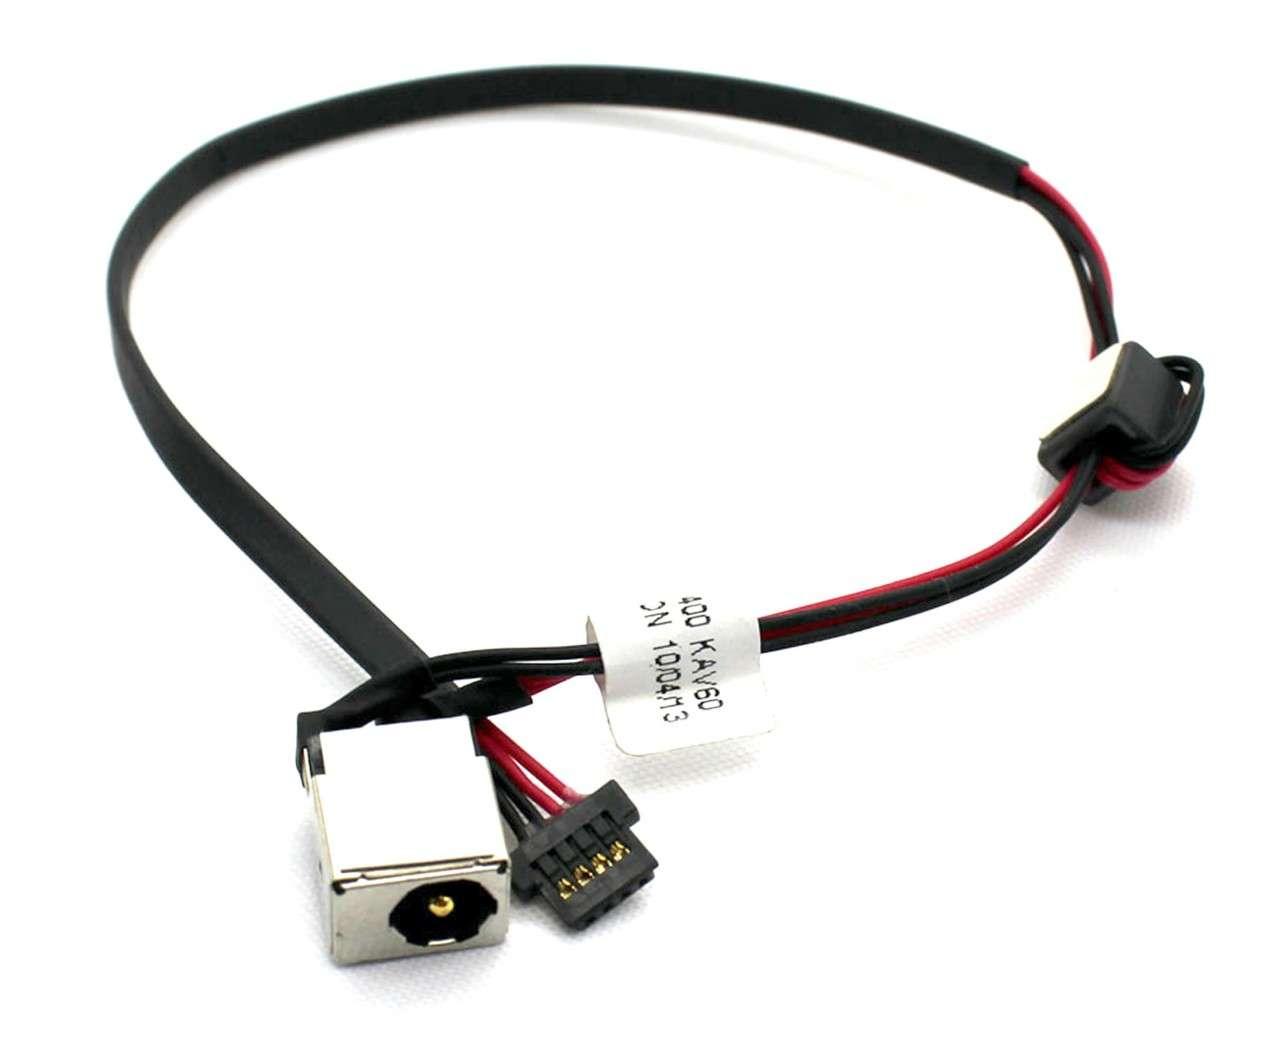 Mufa alimentare laptop Emachines NAV51 cu fir imagine powerlaptop.ro 2021